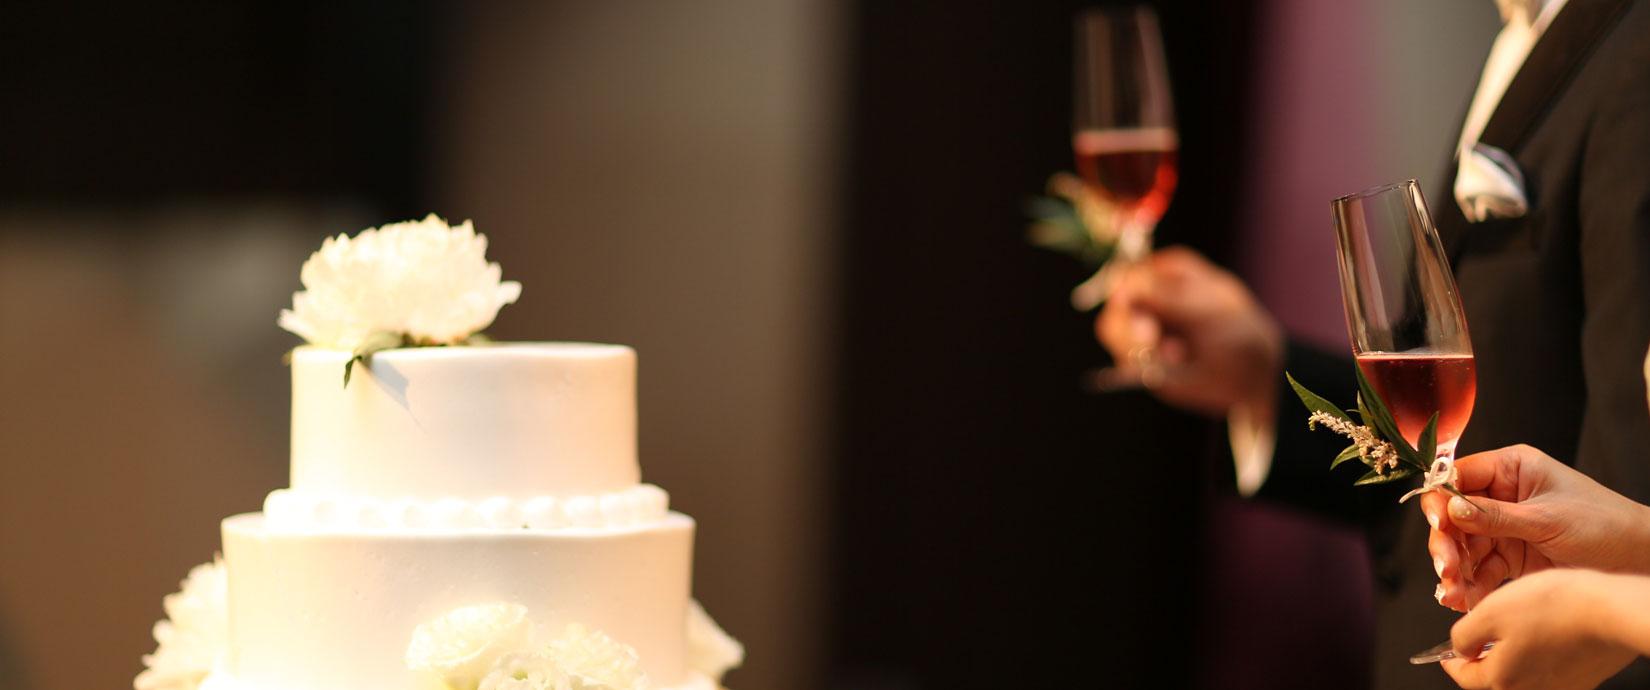 wedding gallery 19